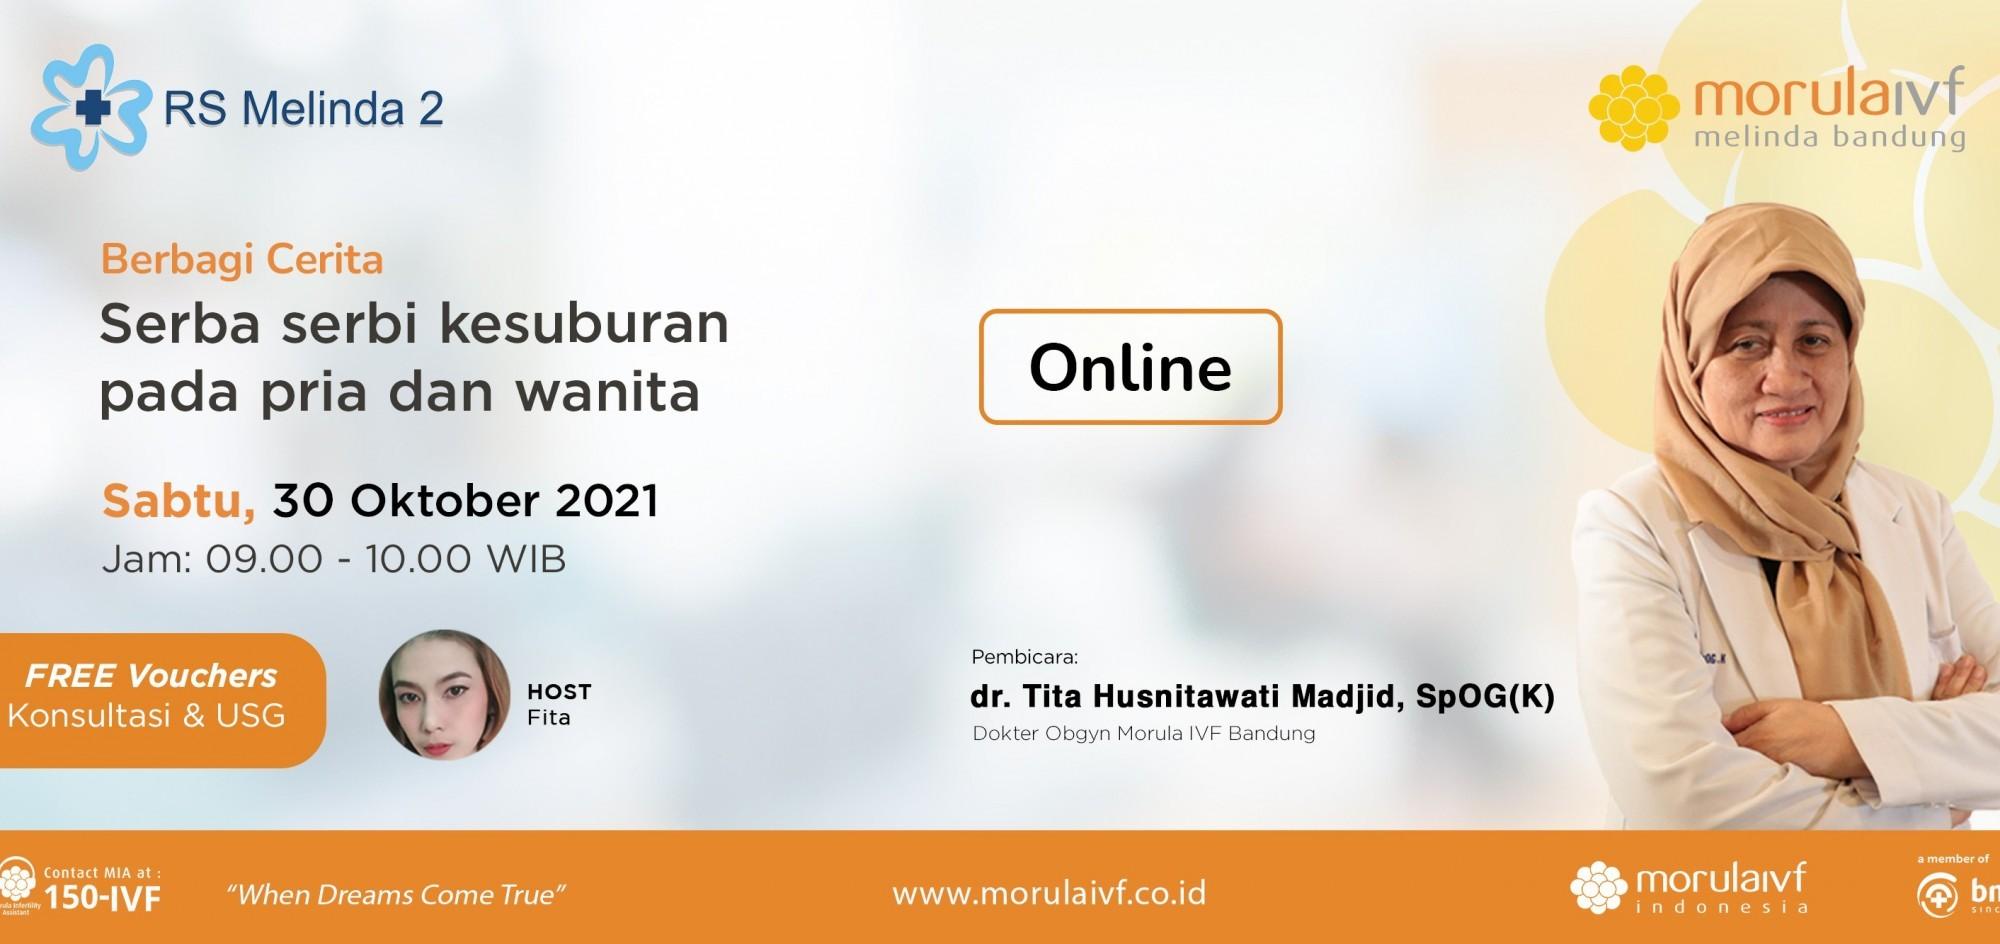 Morula Berbagi Cerita dr. Tita Husnitawati, SpOG(K)